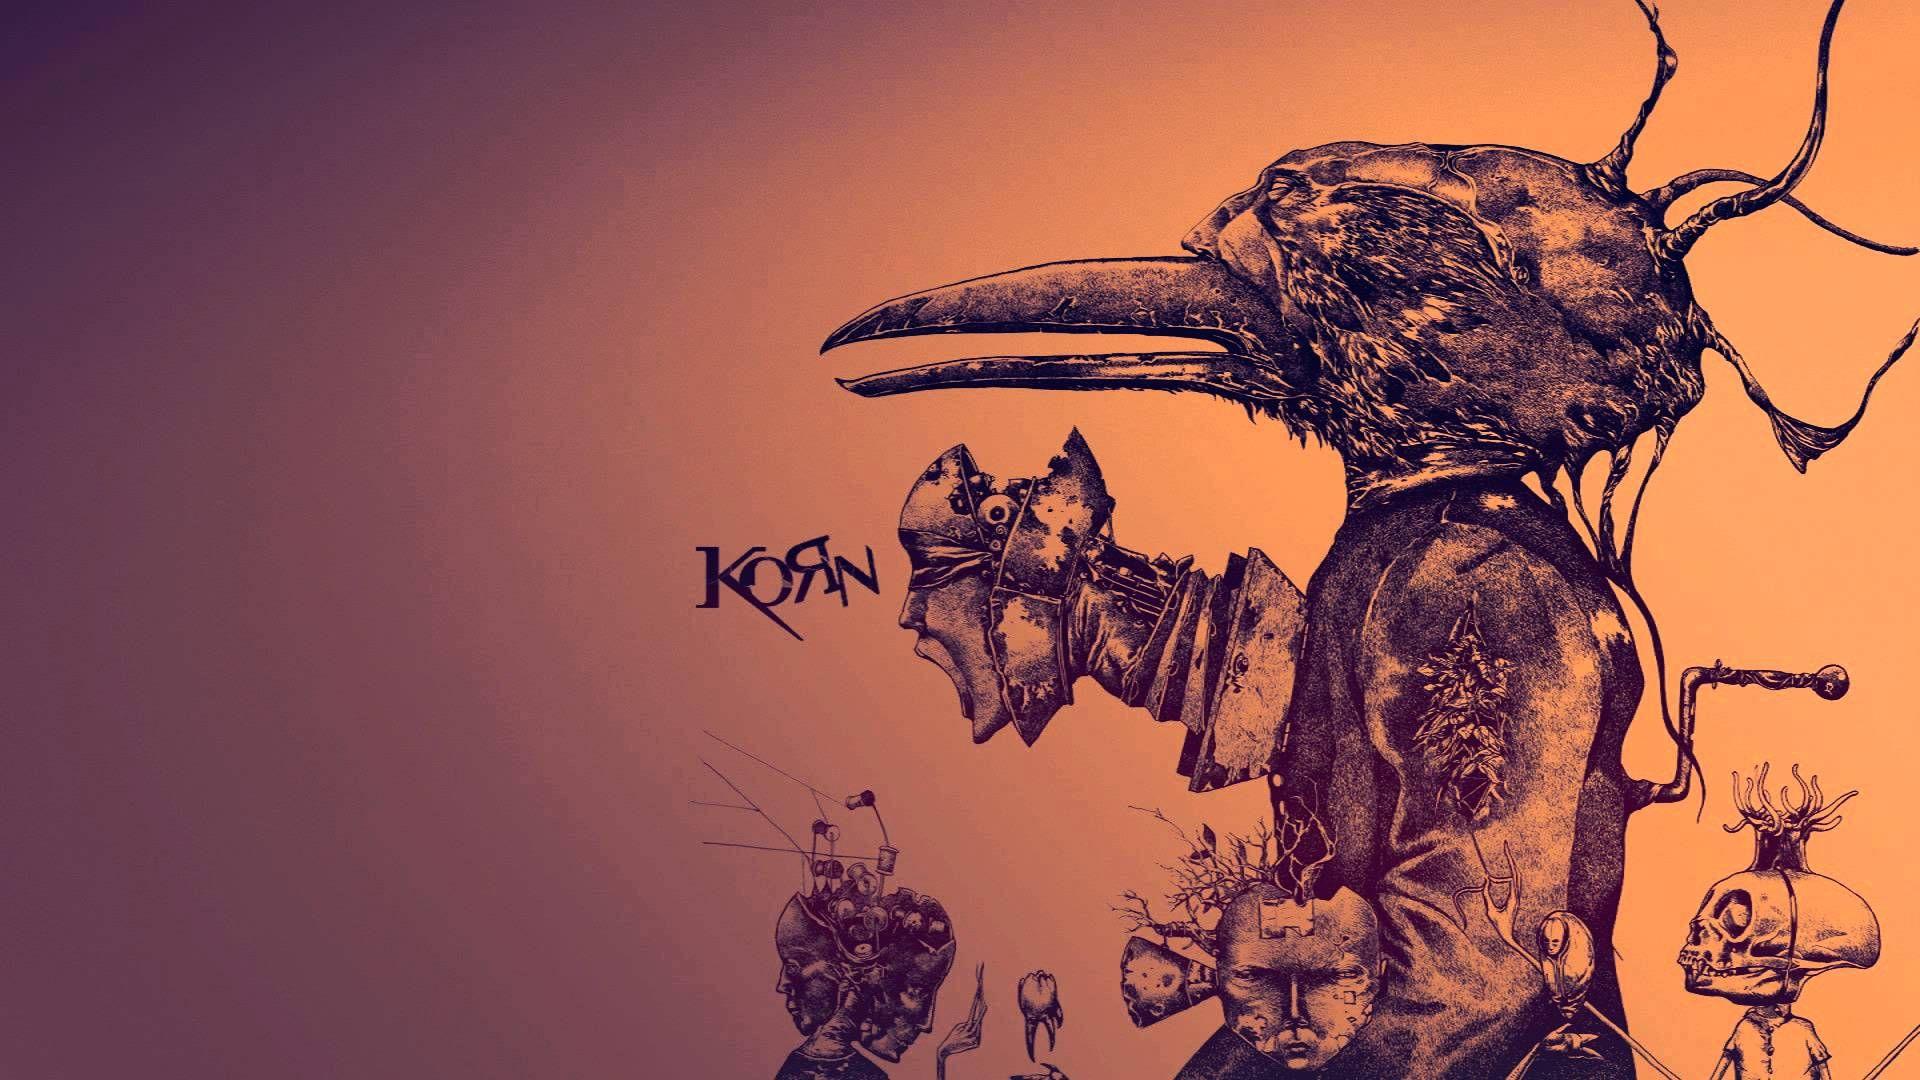 Korn Liar Brandon Has No Game Remix Music Wallpaper Korn Hd Wallpaper